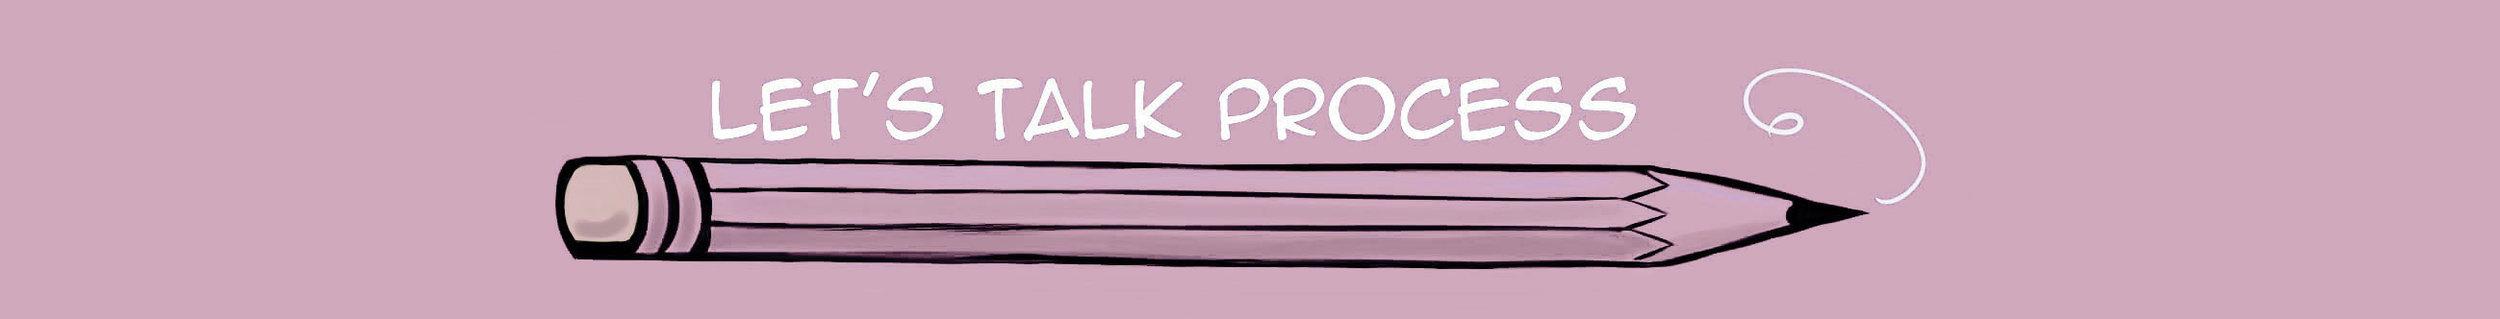 Let's talk pink.jpg